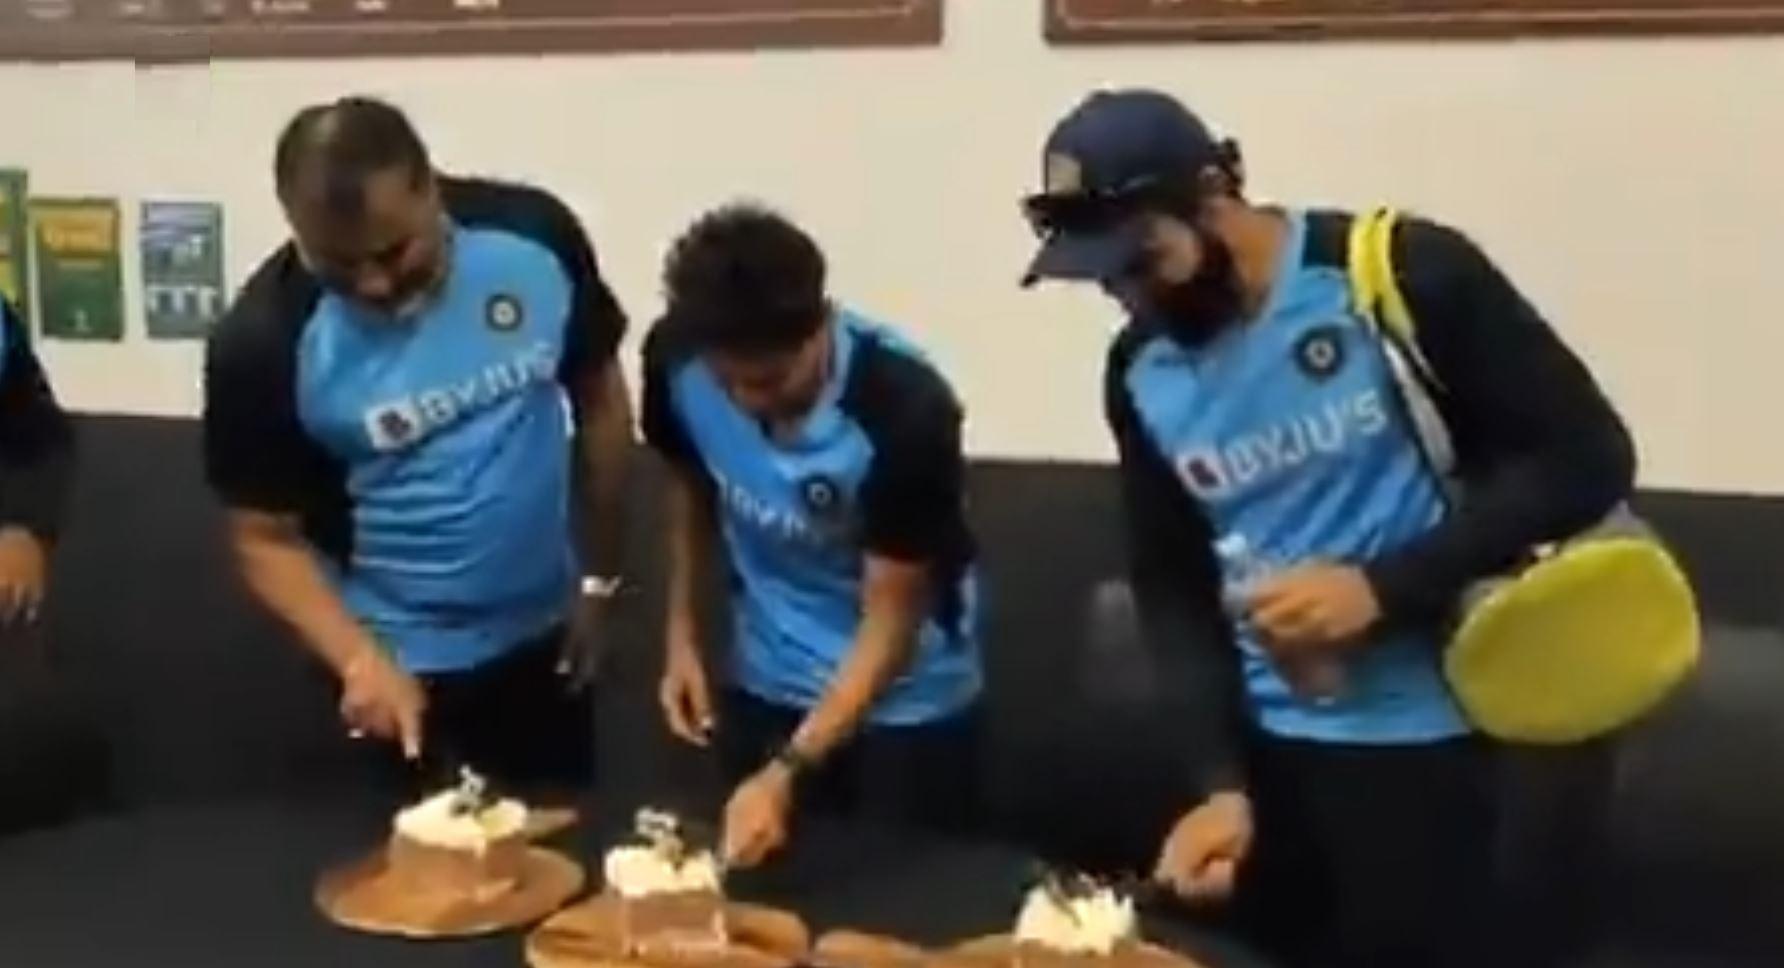 B Arun, Kuldeep Yadav and Ravindra Jadeja cut their birthday cakes   BCCI Twitter